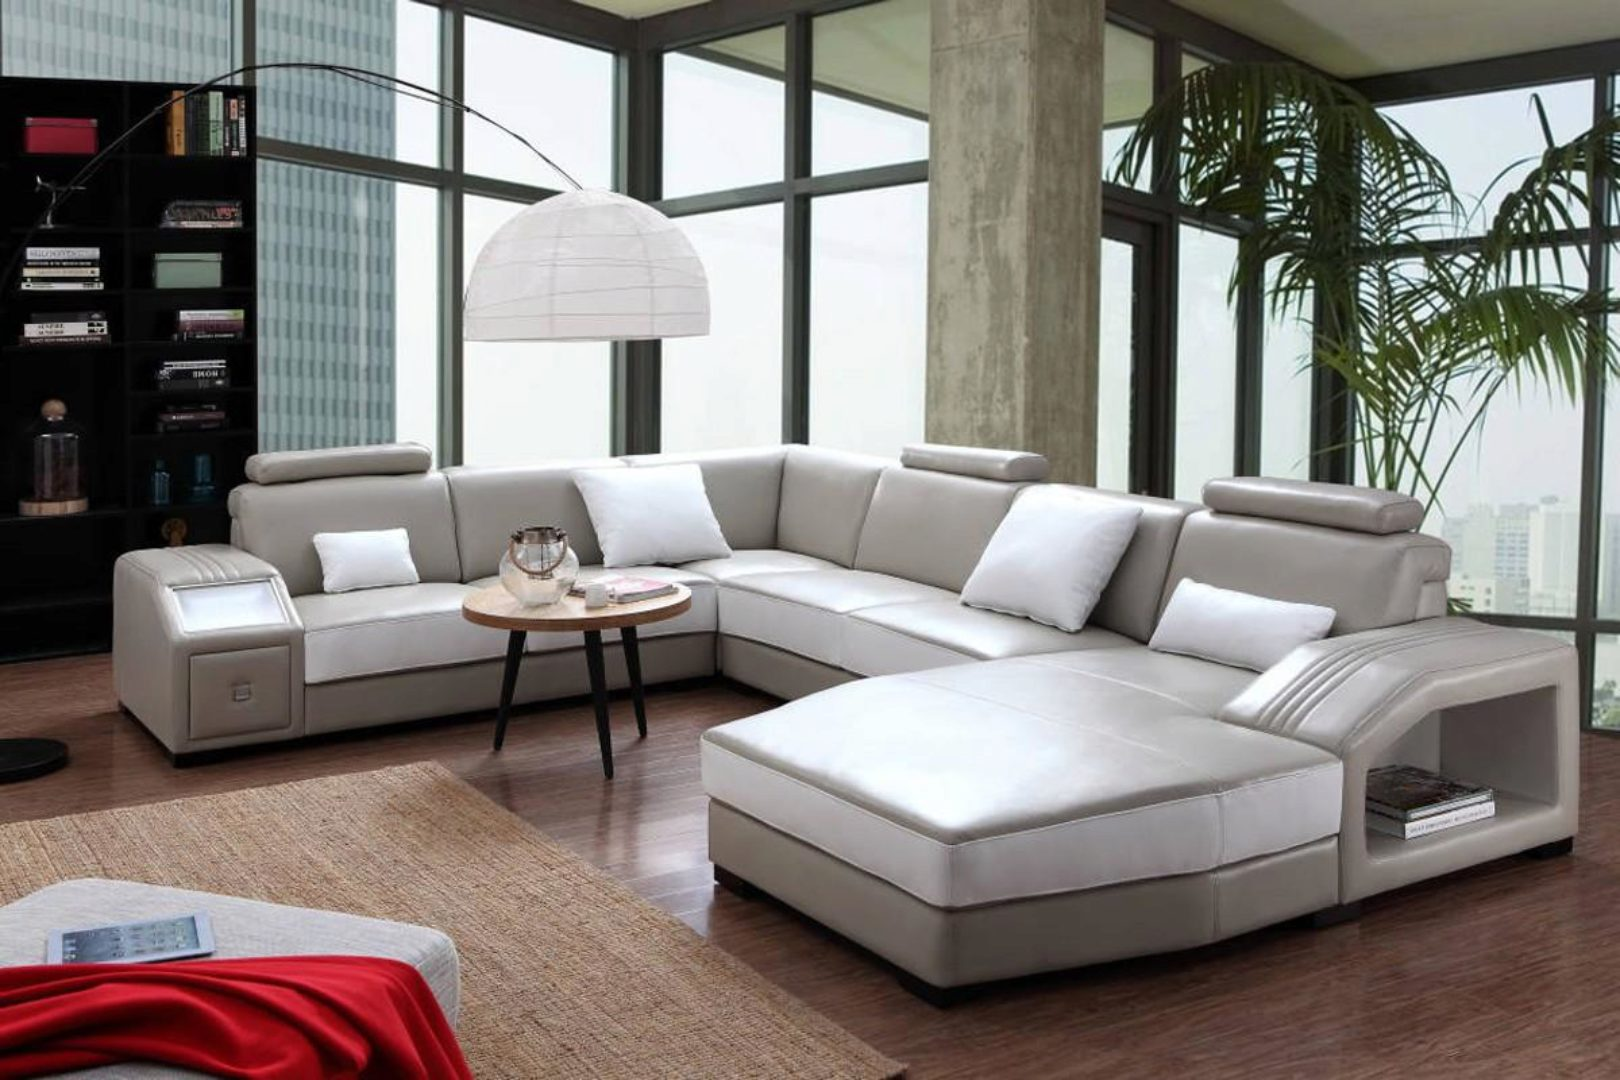 vig divani casa charlie modern light grey white leather sectional sofa w ottoman